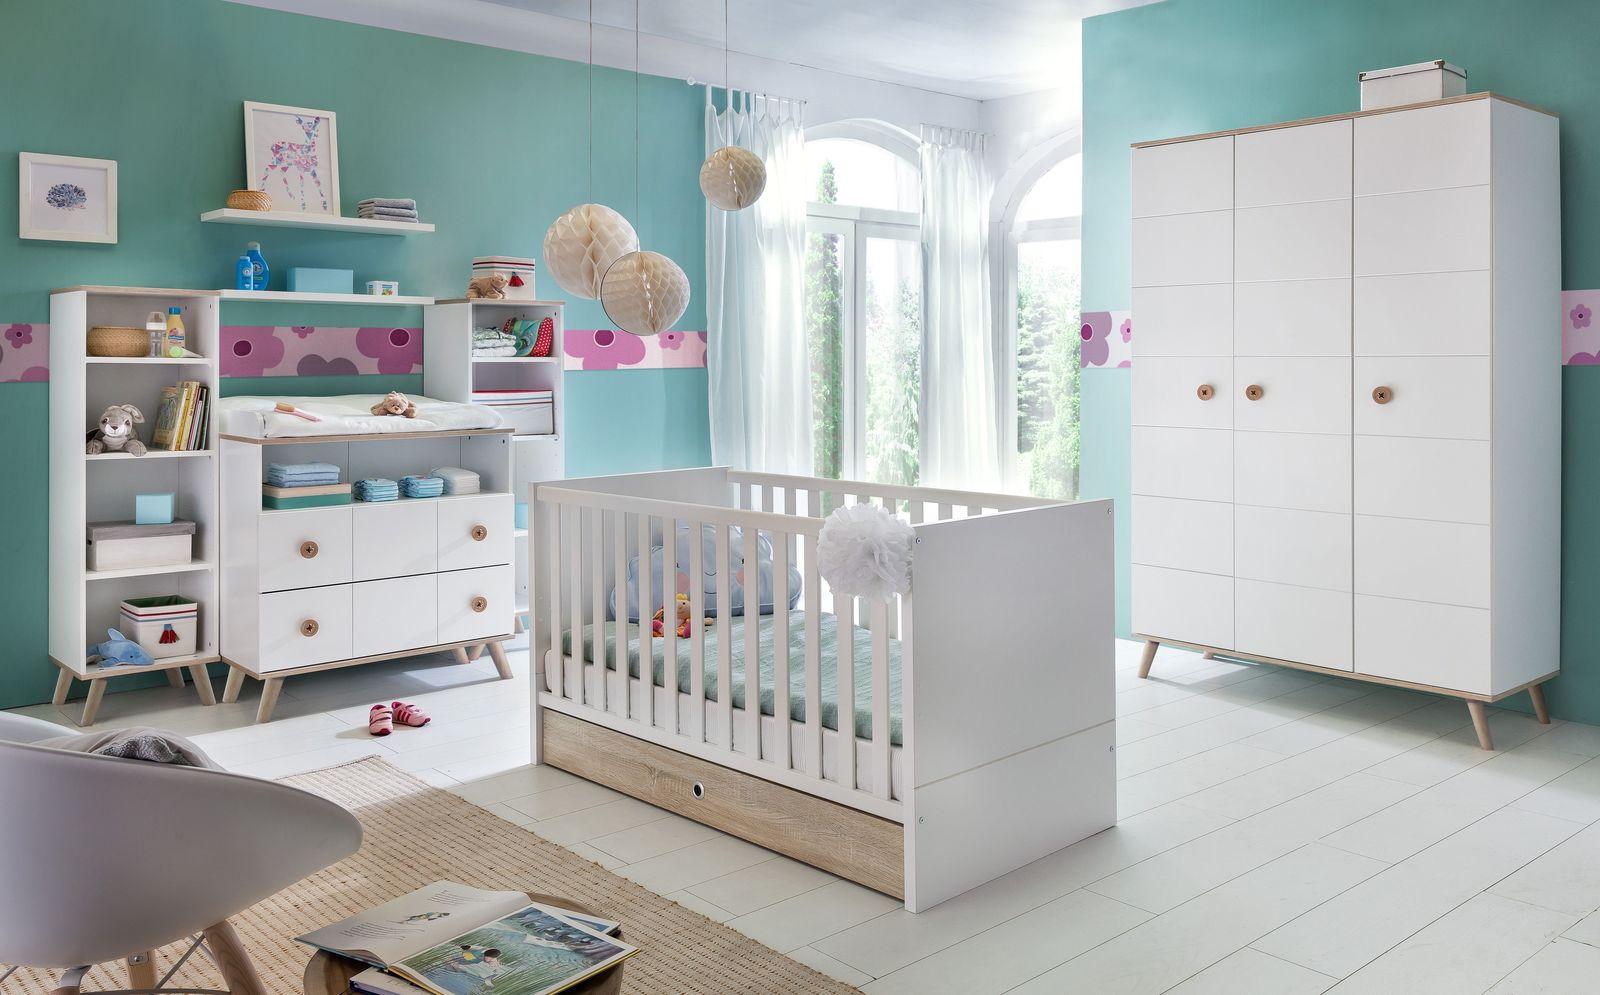 babyzimmer komplett als set g nstig kaufen. Black Bedroom Furniture Sets. Home Design Ideas